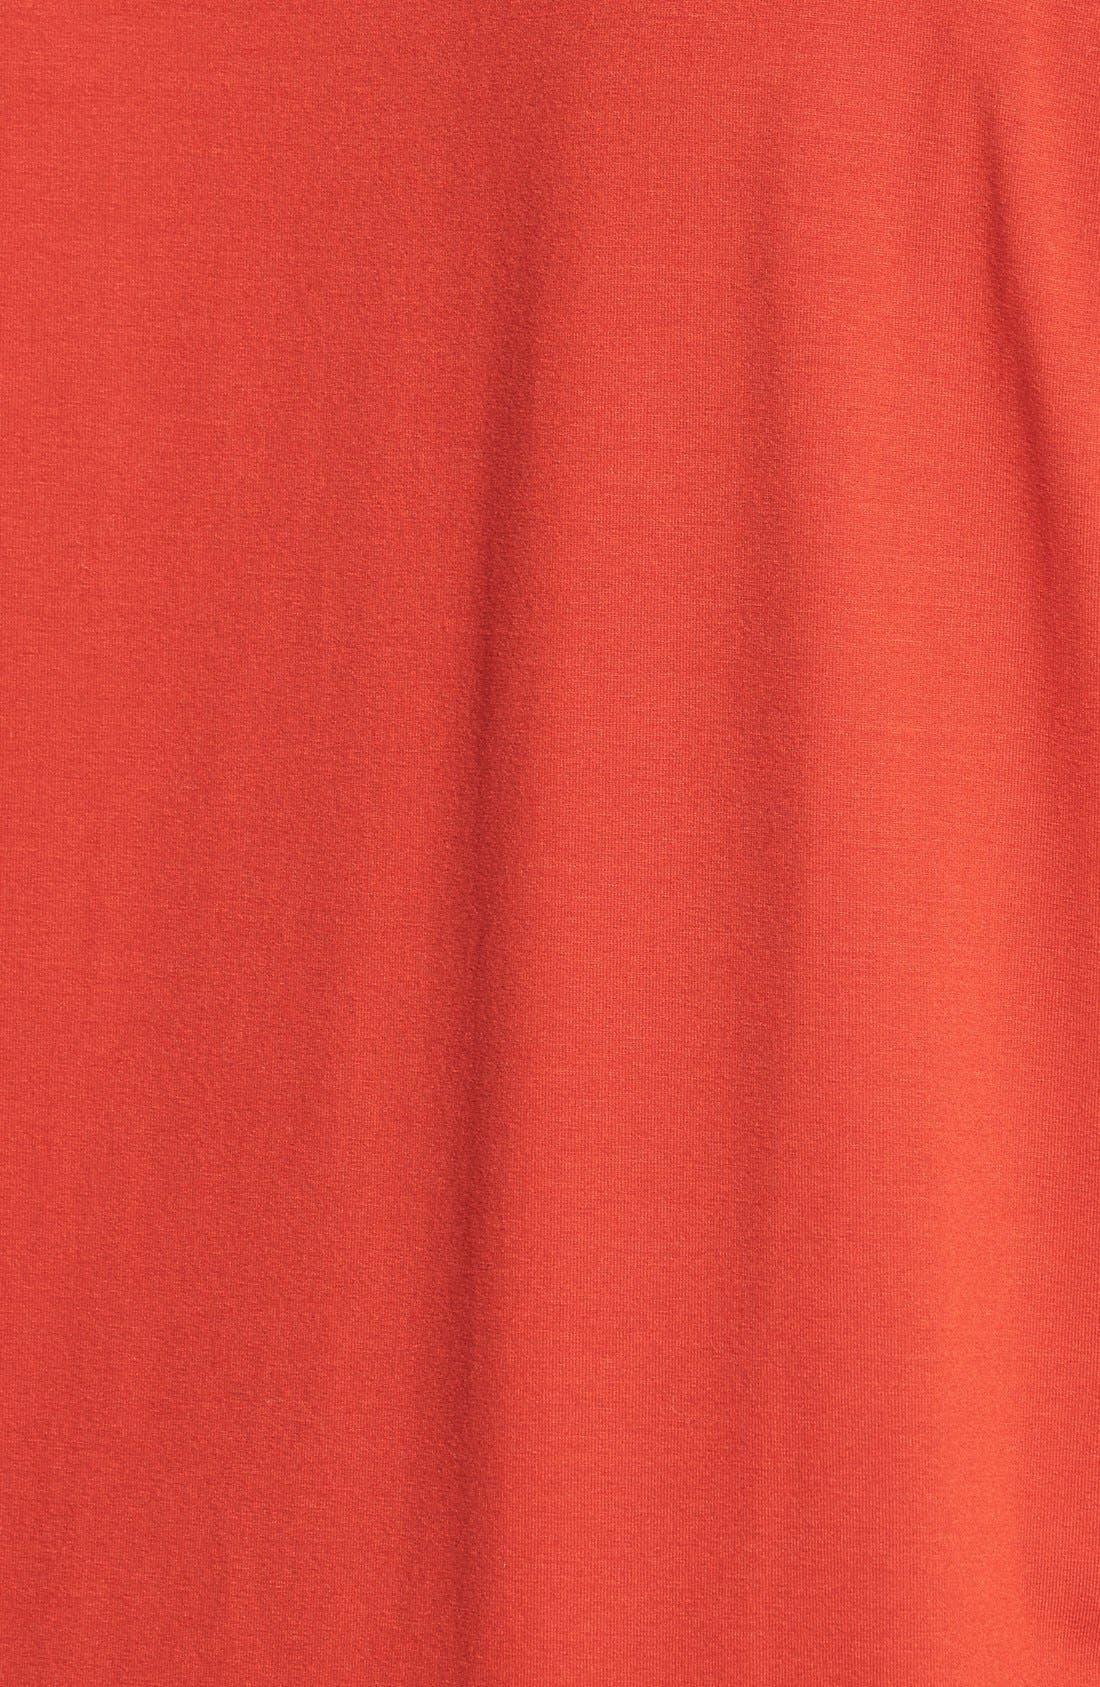 Alternate Image 3  - Eileen Fisher V-Neck Asymmetric Jersey Top (Plus Size)